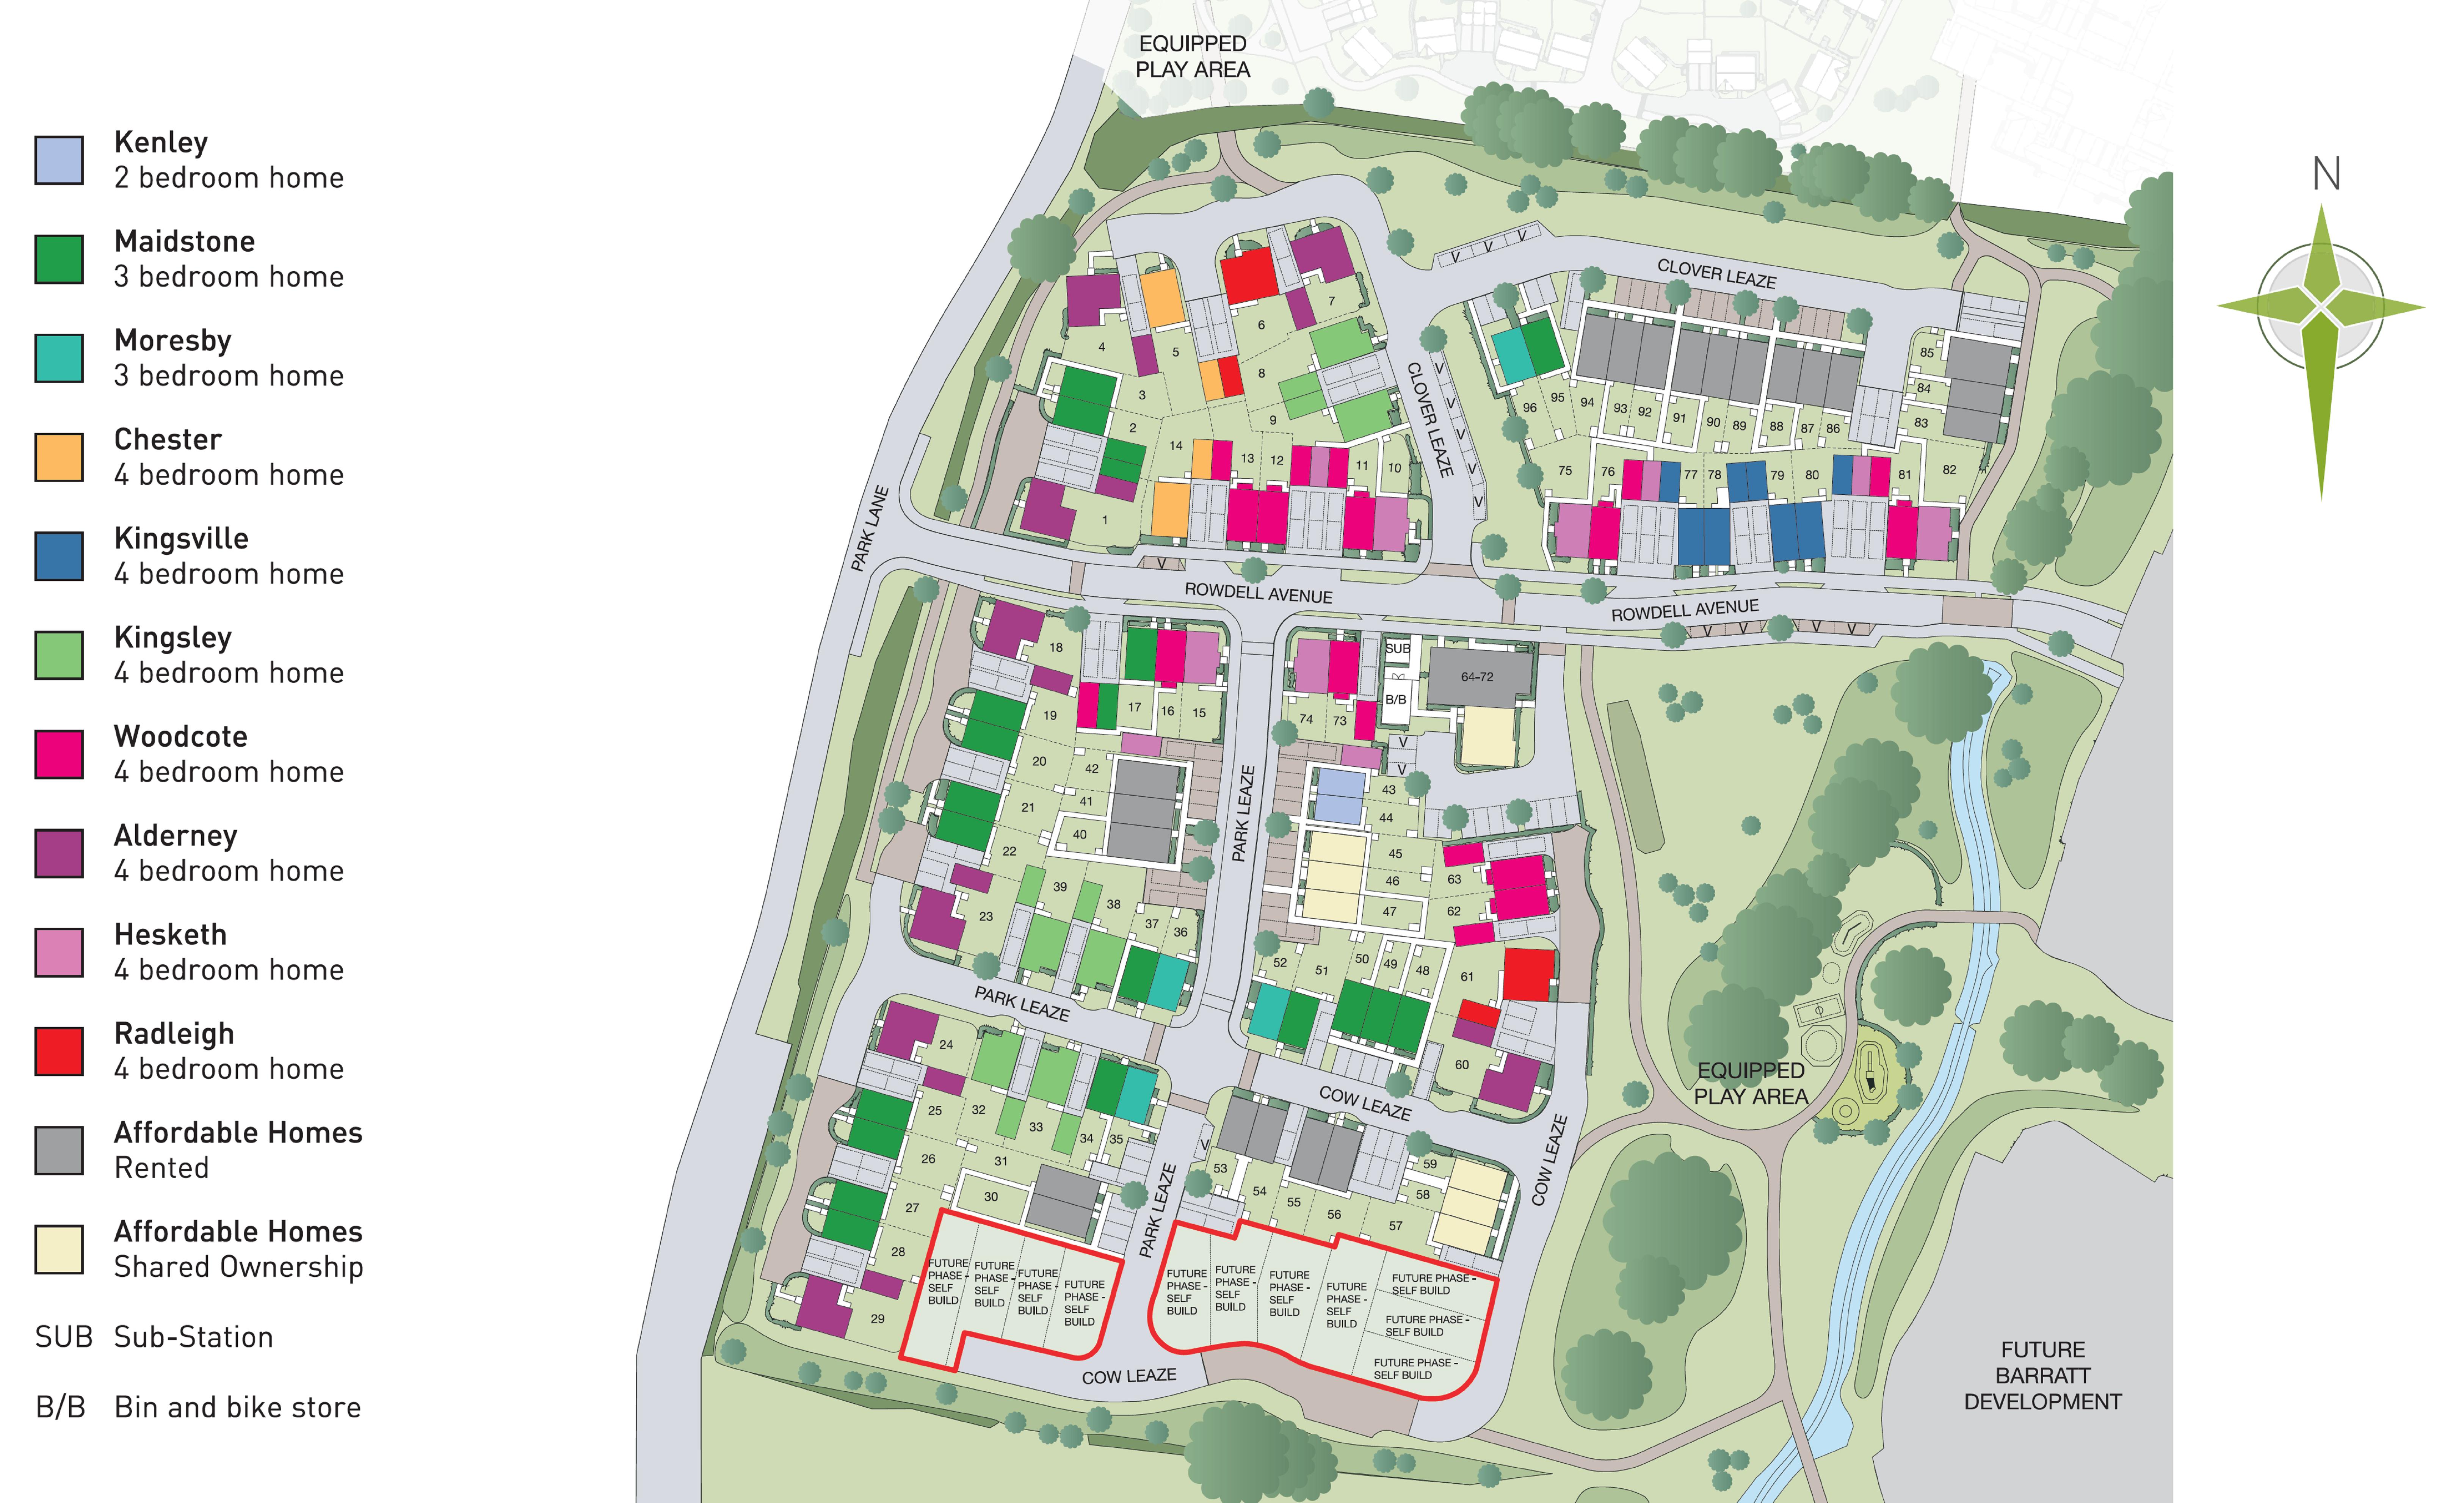 Blackberry Park Site Plan